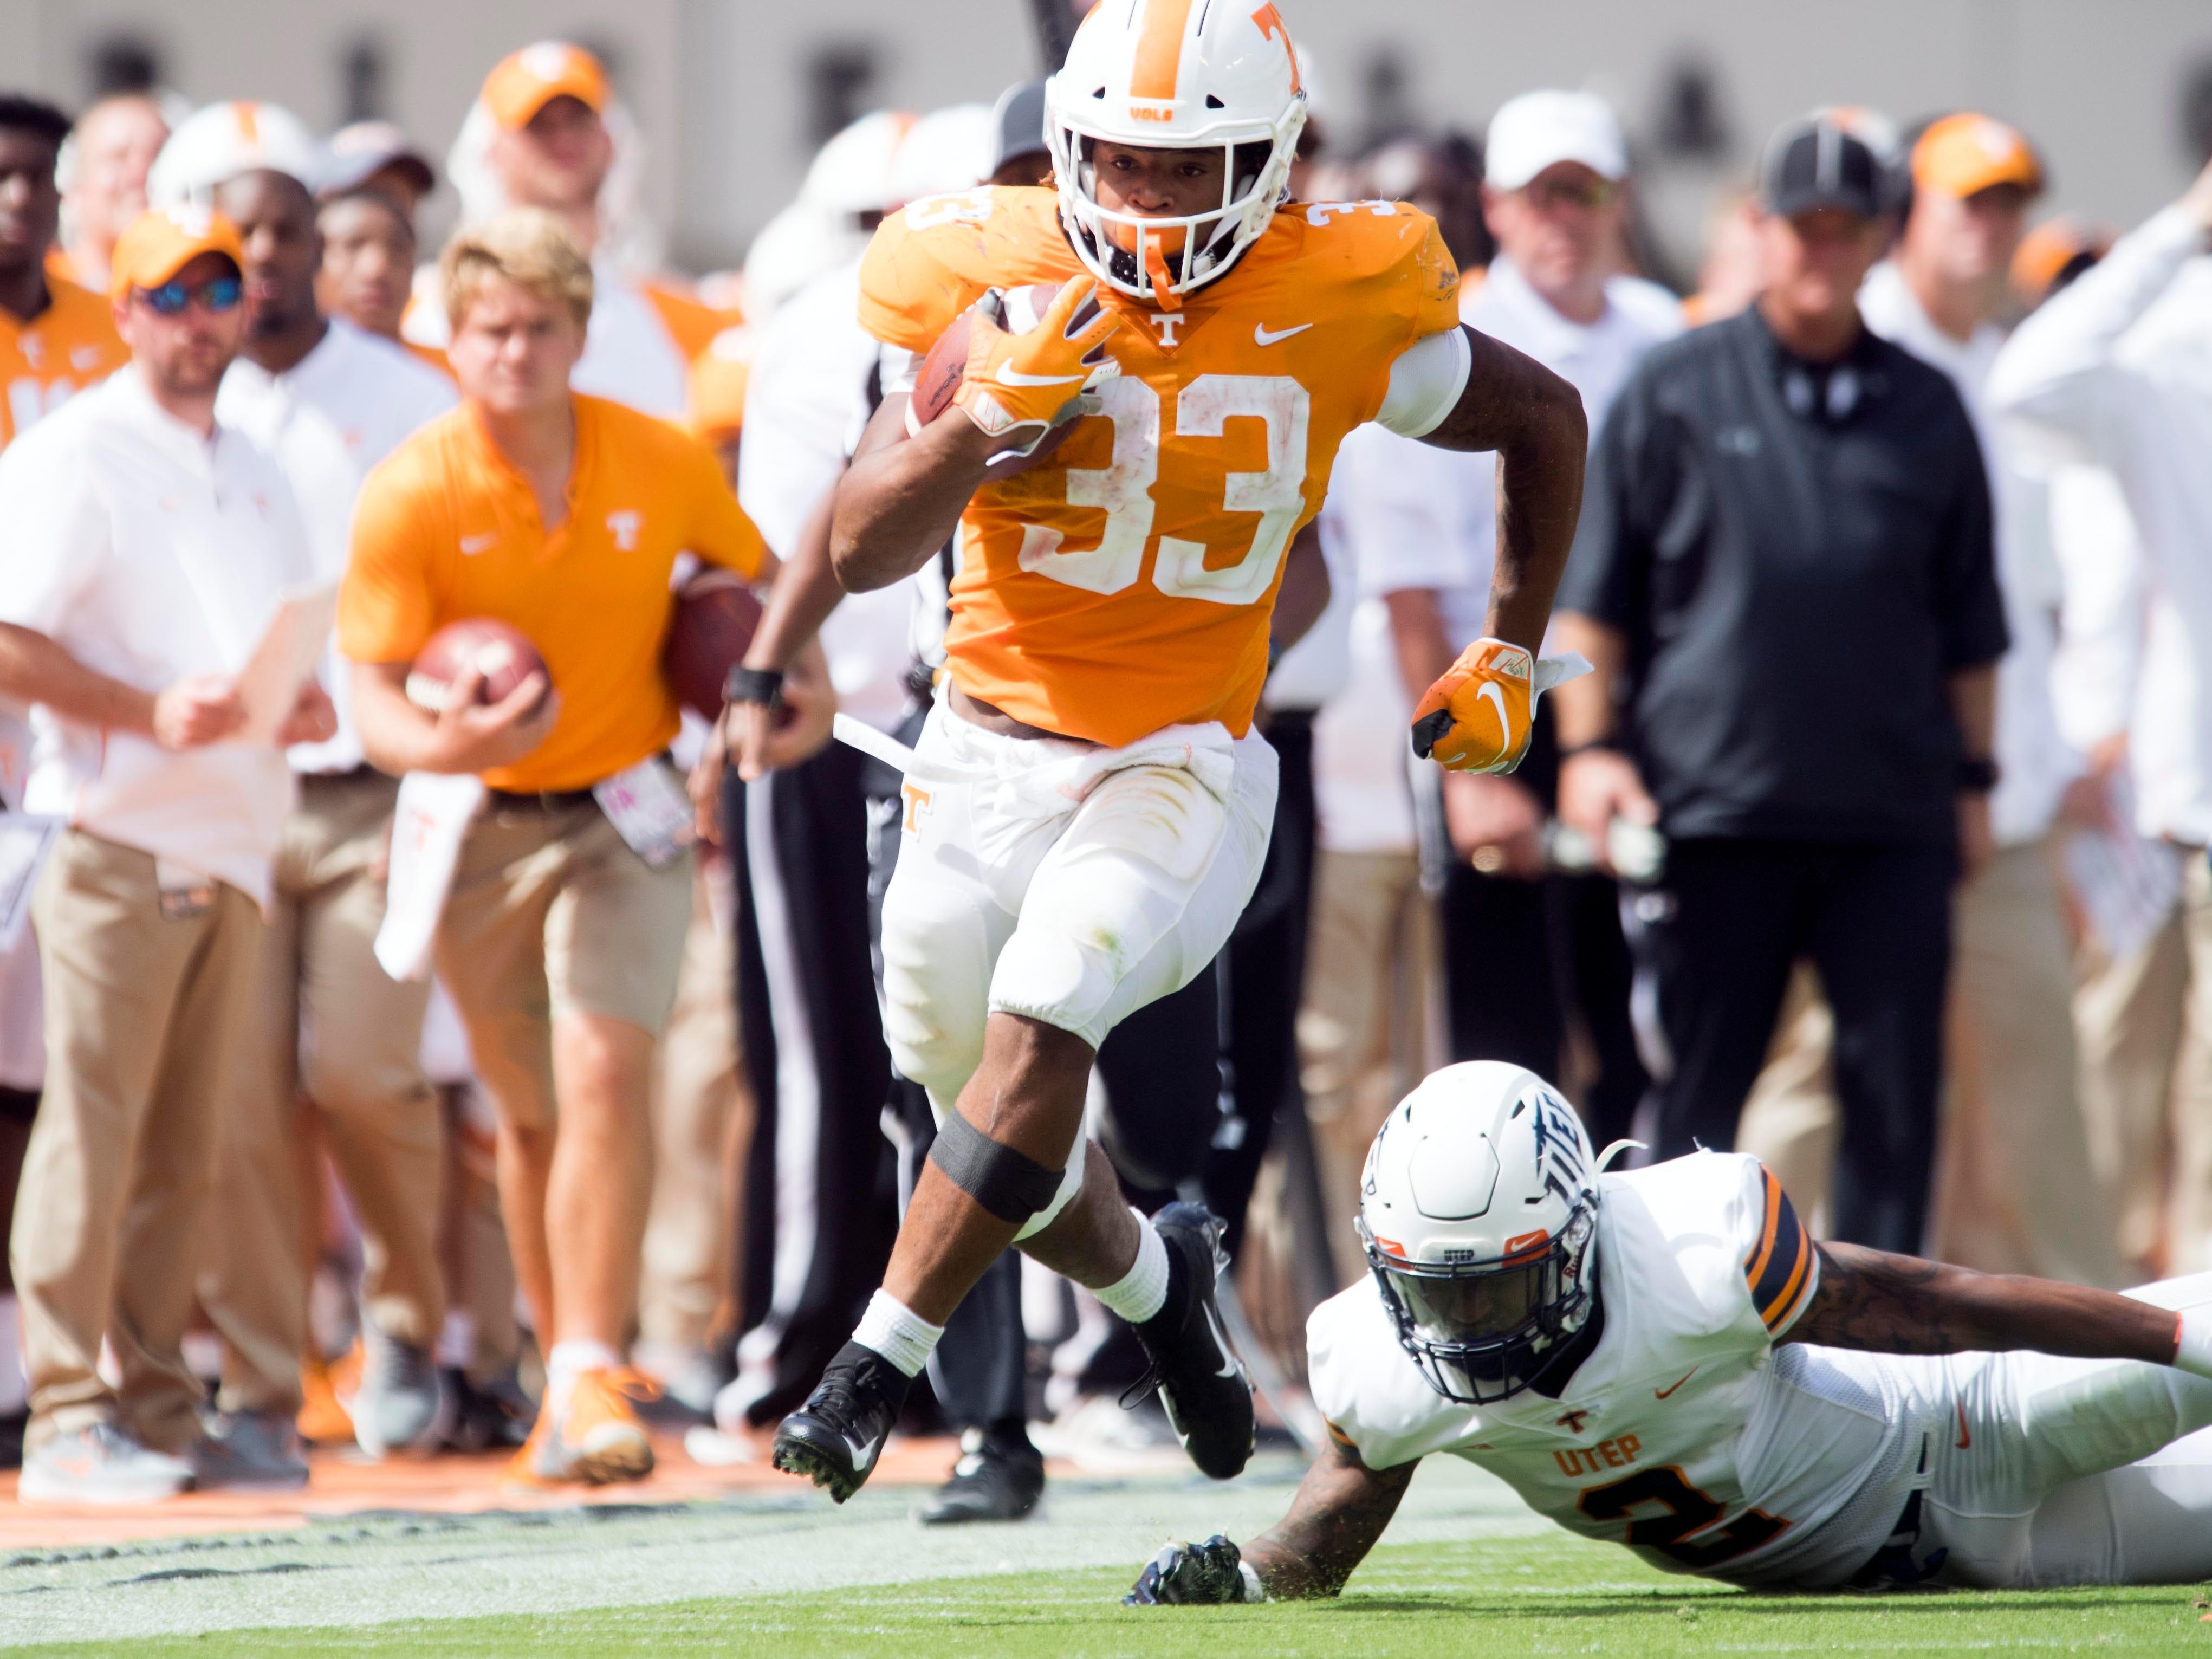 Tennessee running back Jeremy Banks (33) gets past UTEP defensive back Michael Lewis (2) on Saturday, September 15, 2018.